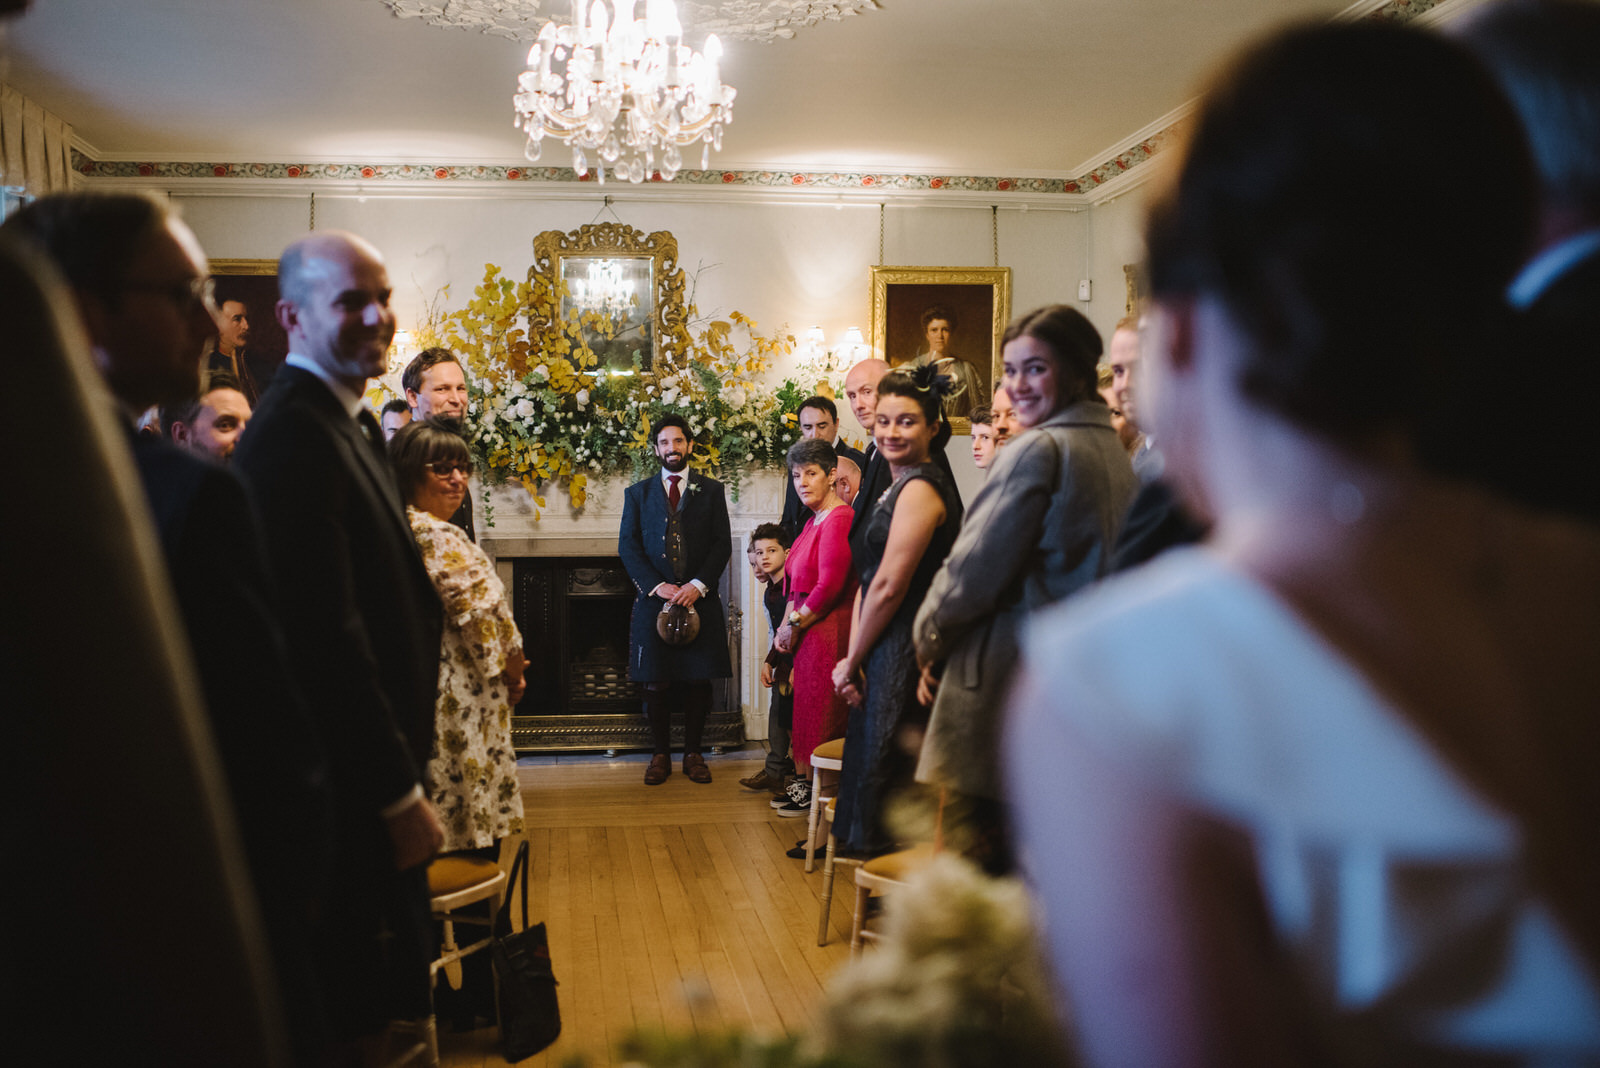 029-COLSTOUN-HOUSE-WEDDING-ALTERNATIVE-WEDDING-PHOTOGRAPHER-GLASGOW-WEDDING-PHOTOGRAPHER-STYLISH-SCOTTISH-WEDDING.JPG